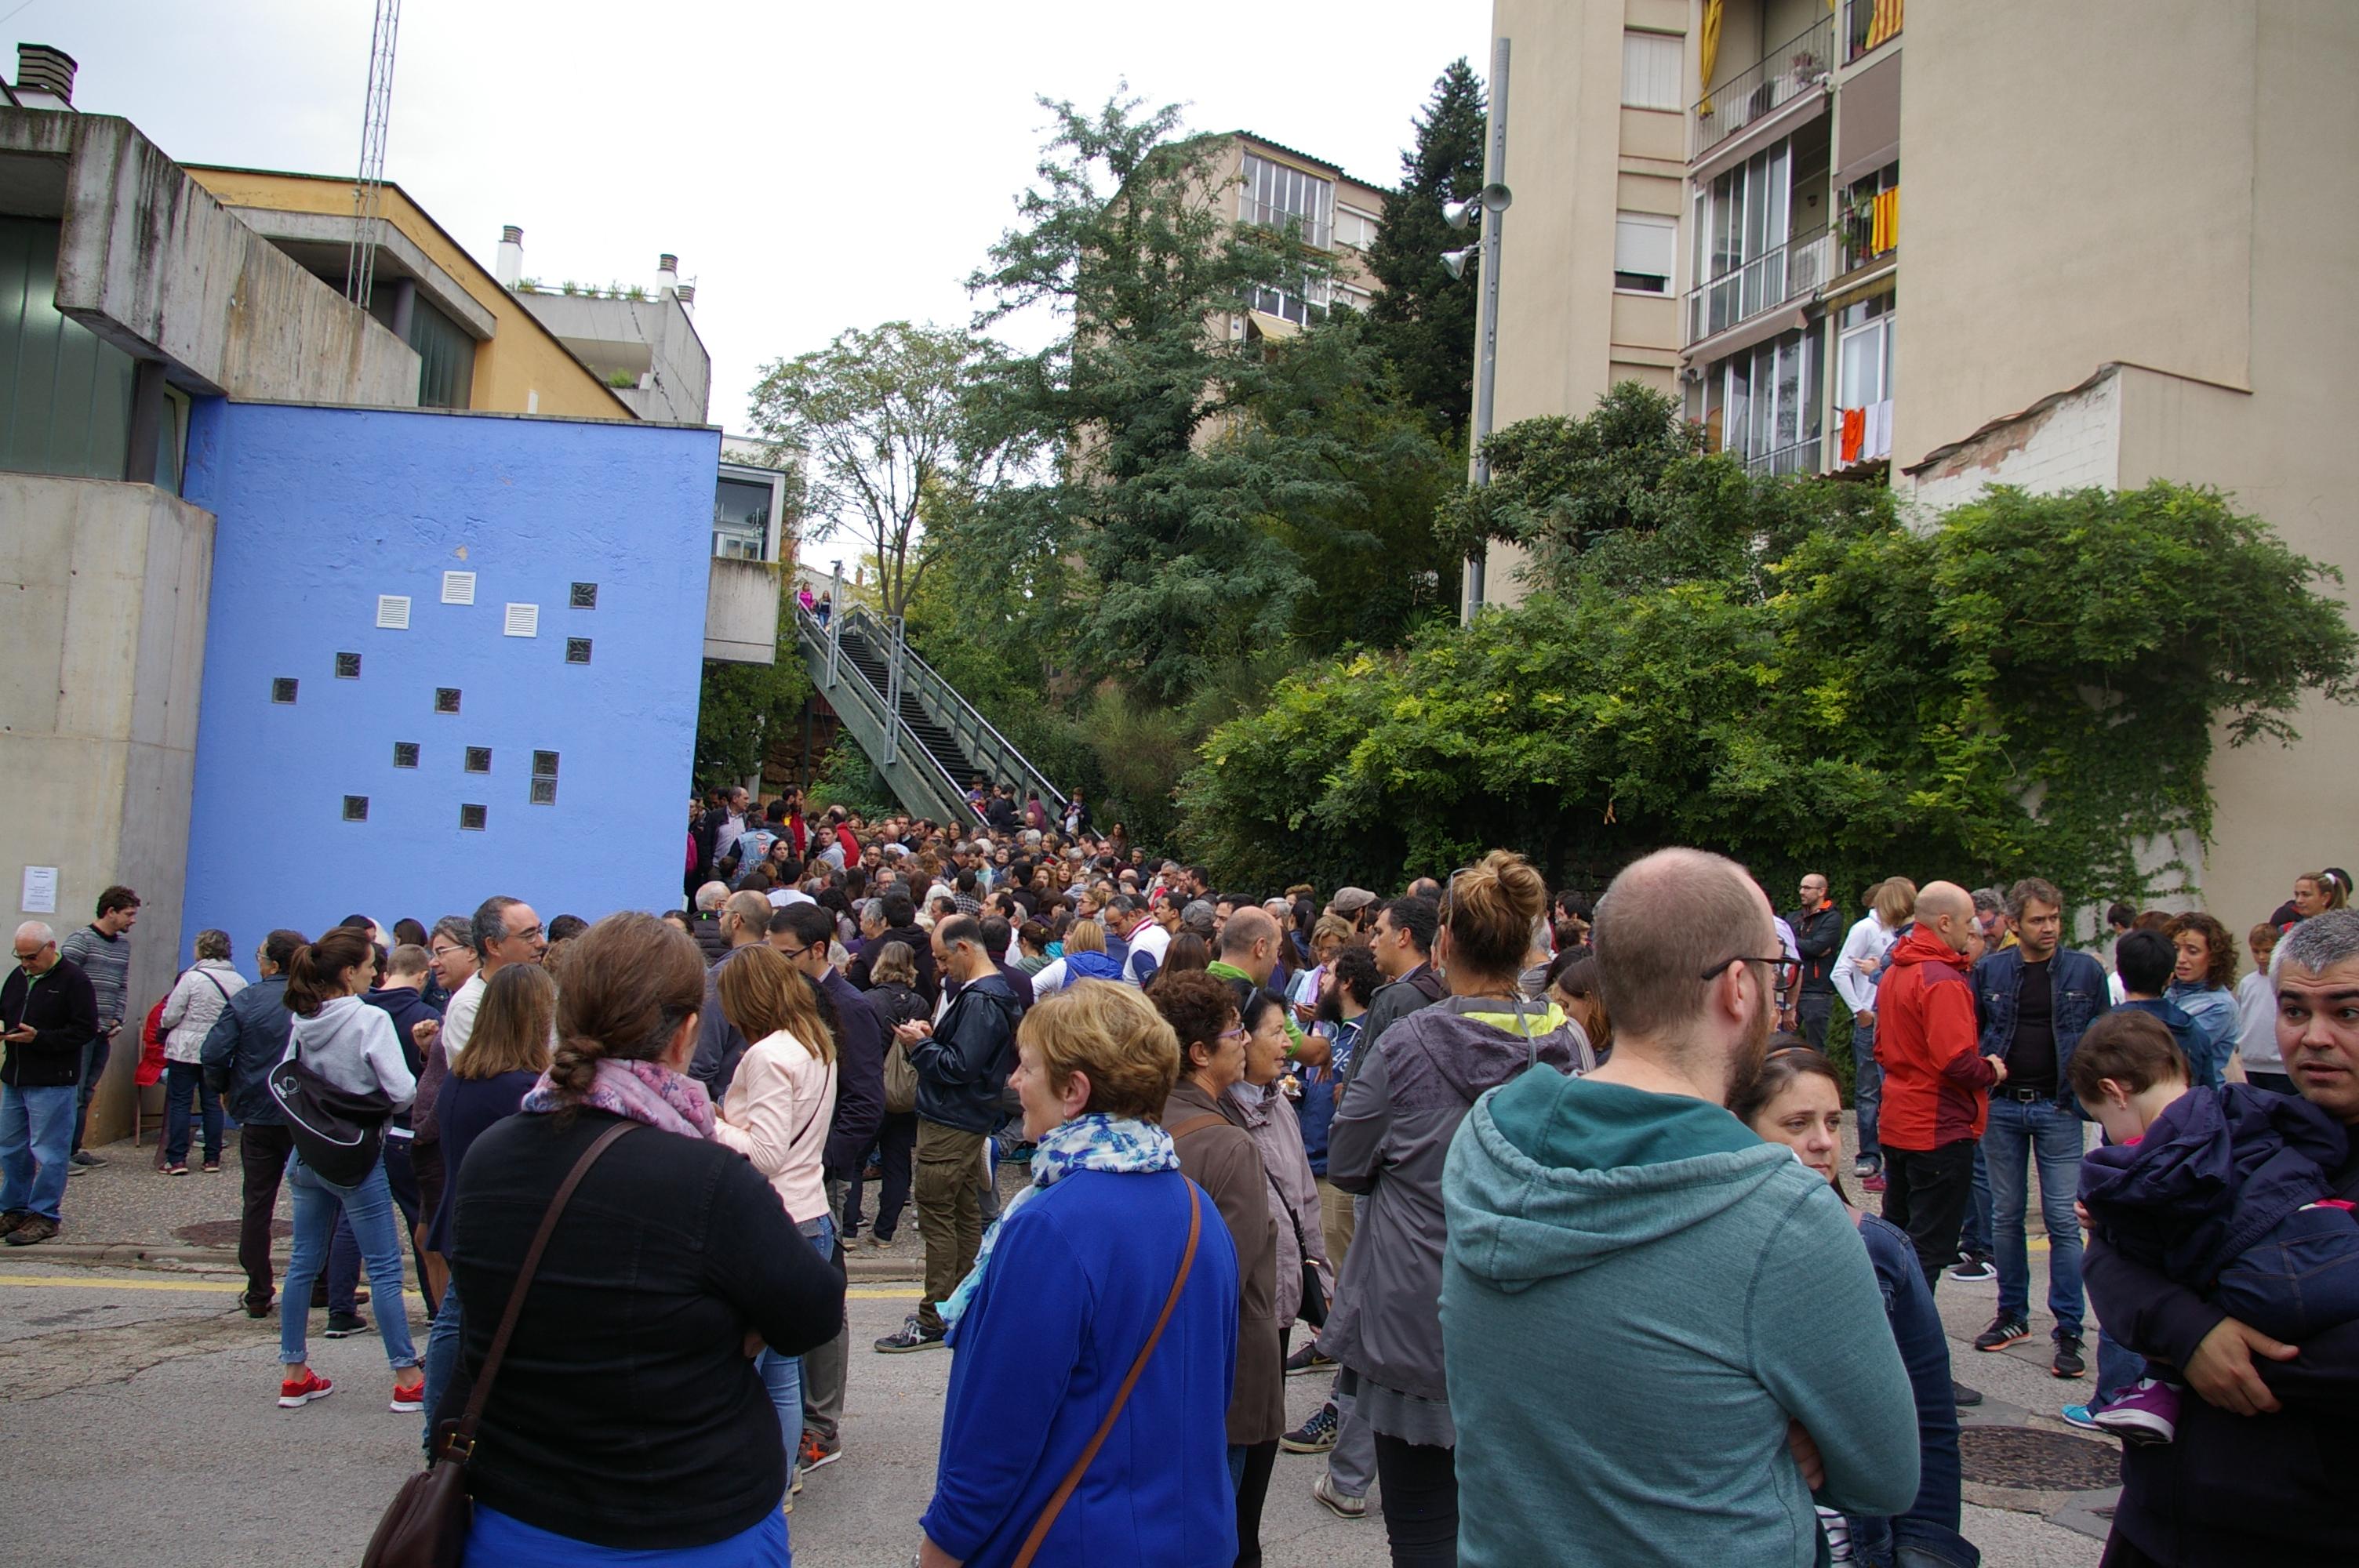 Polling_day_crowds_Girona_(2).jpg